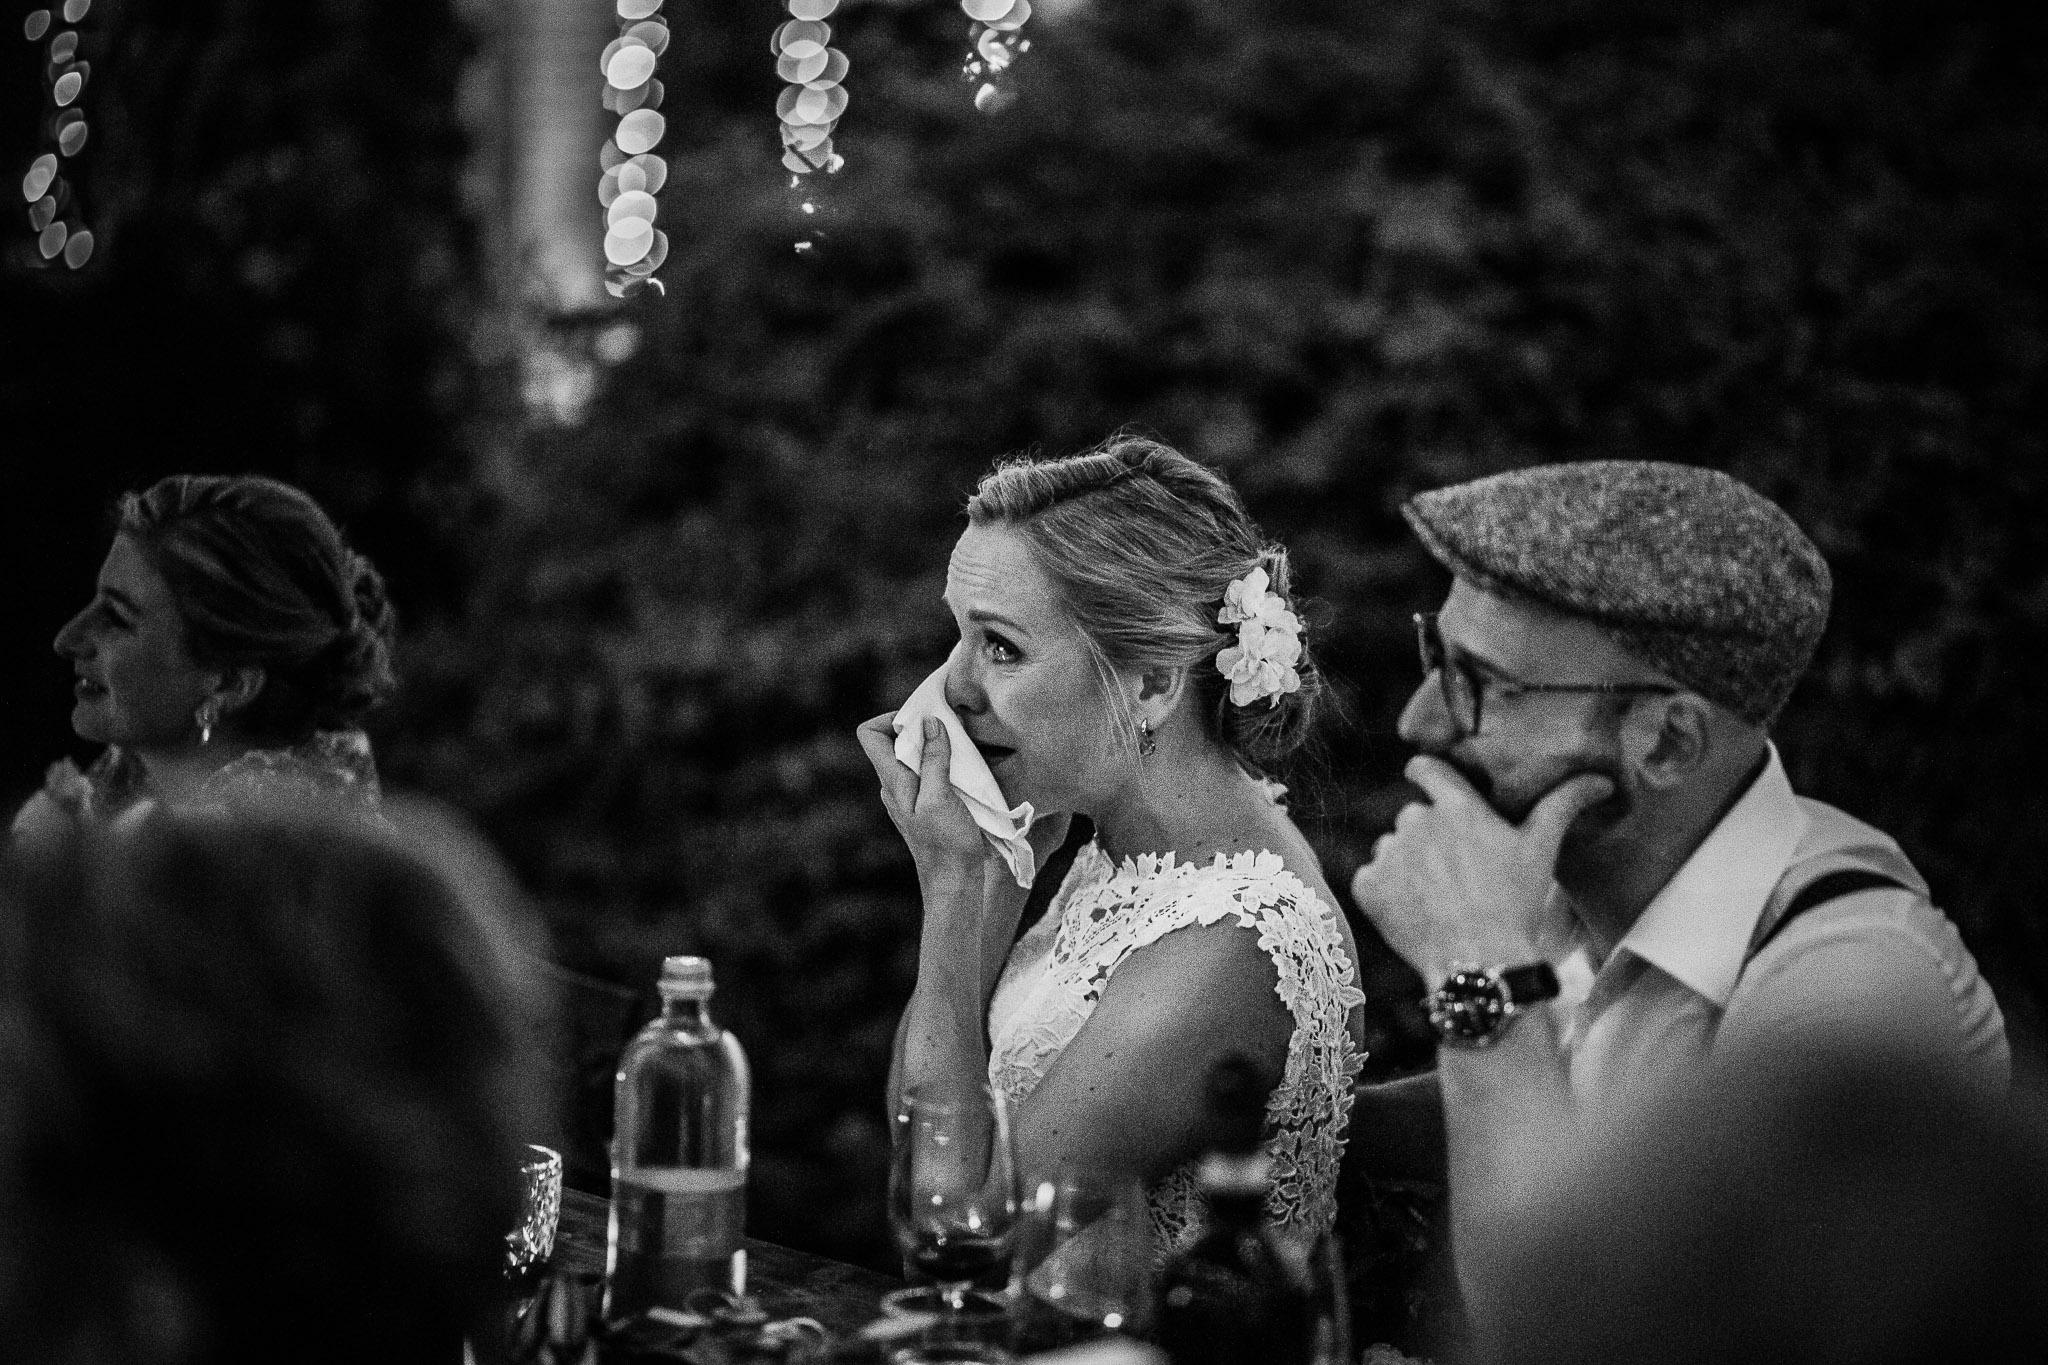 Bride and groom at their evening wedding party at La Villa Hotel, Mombaruzzo